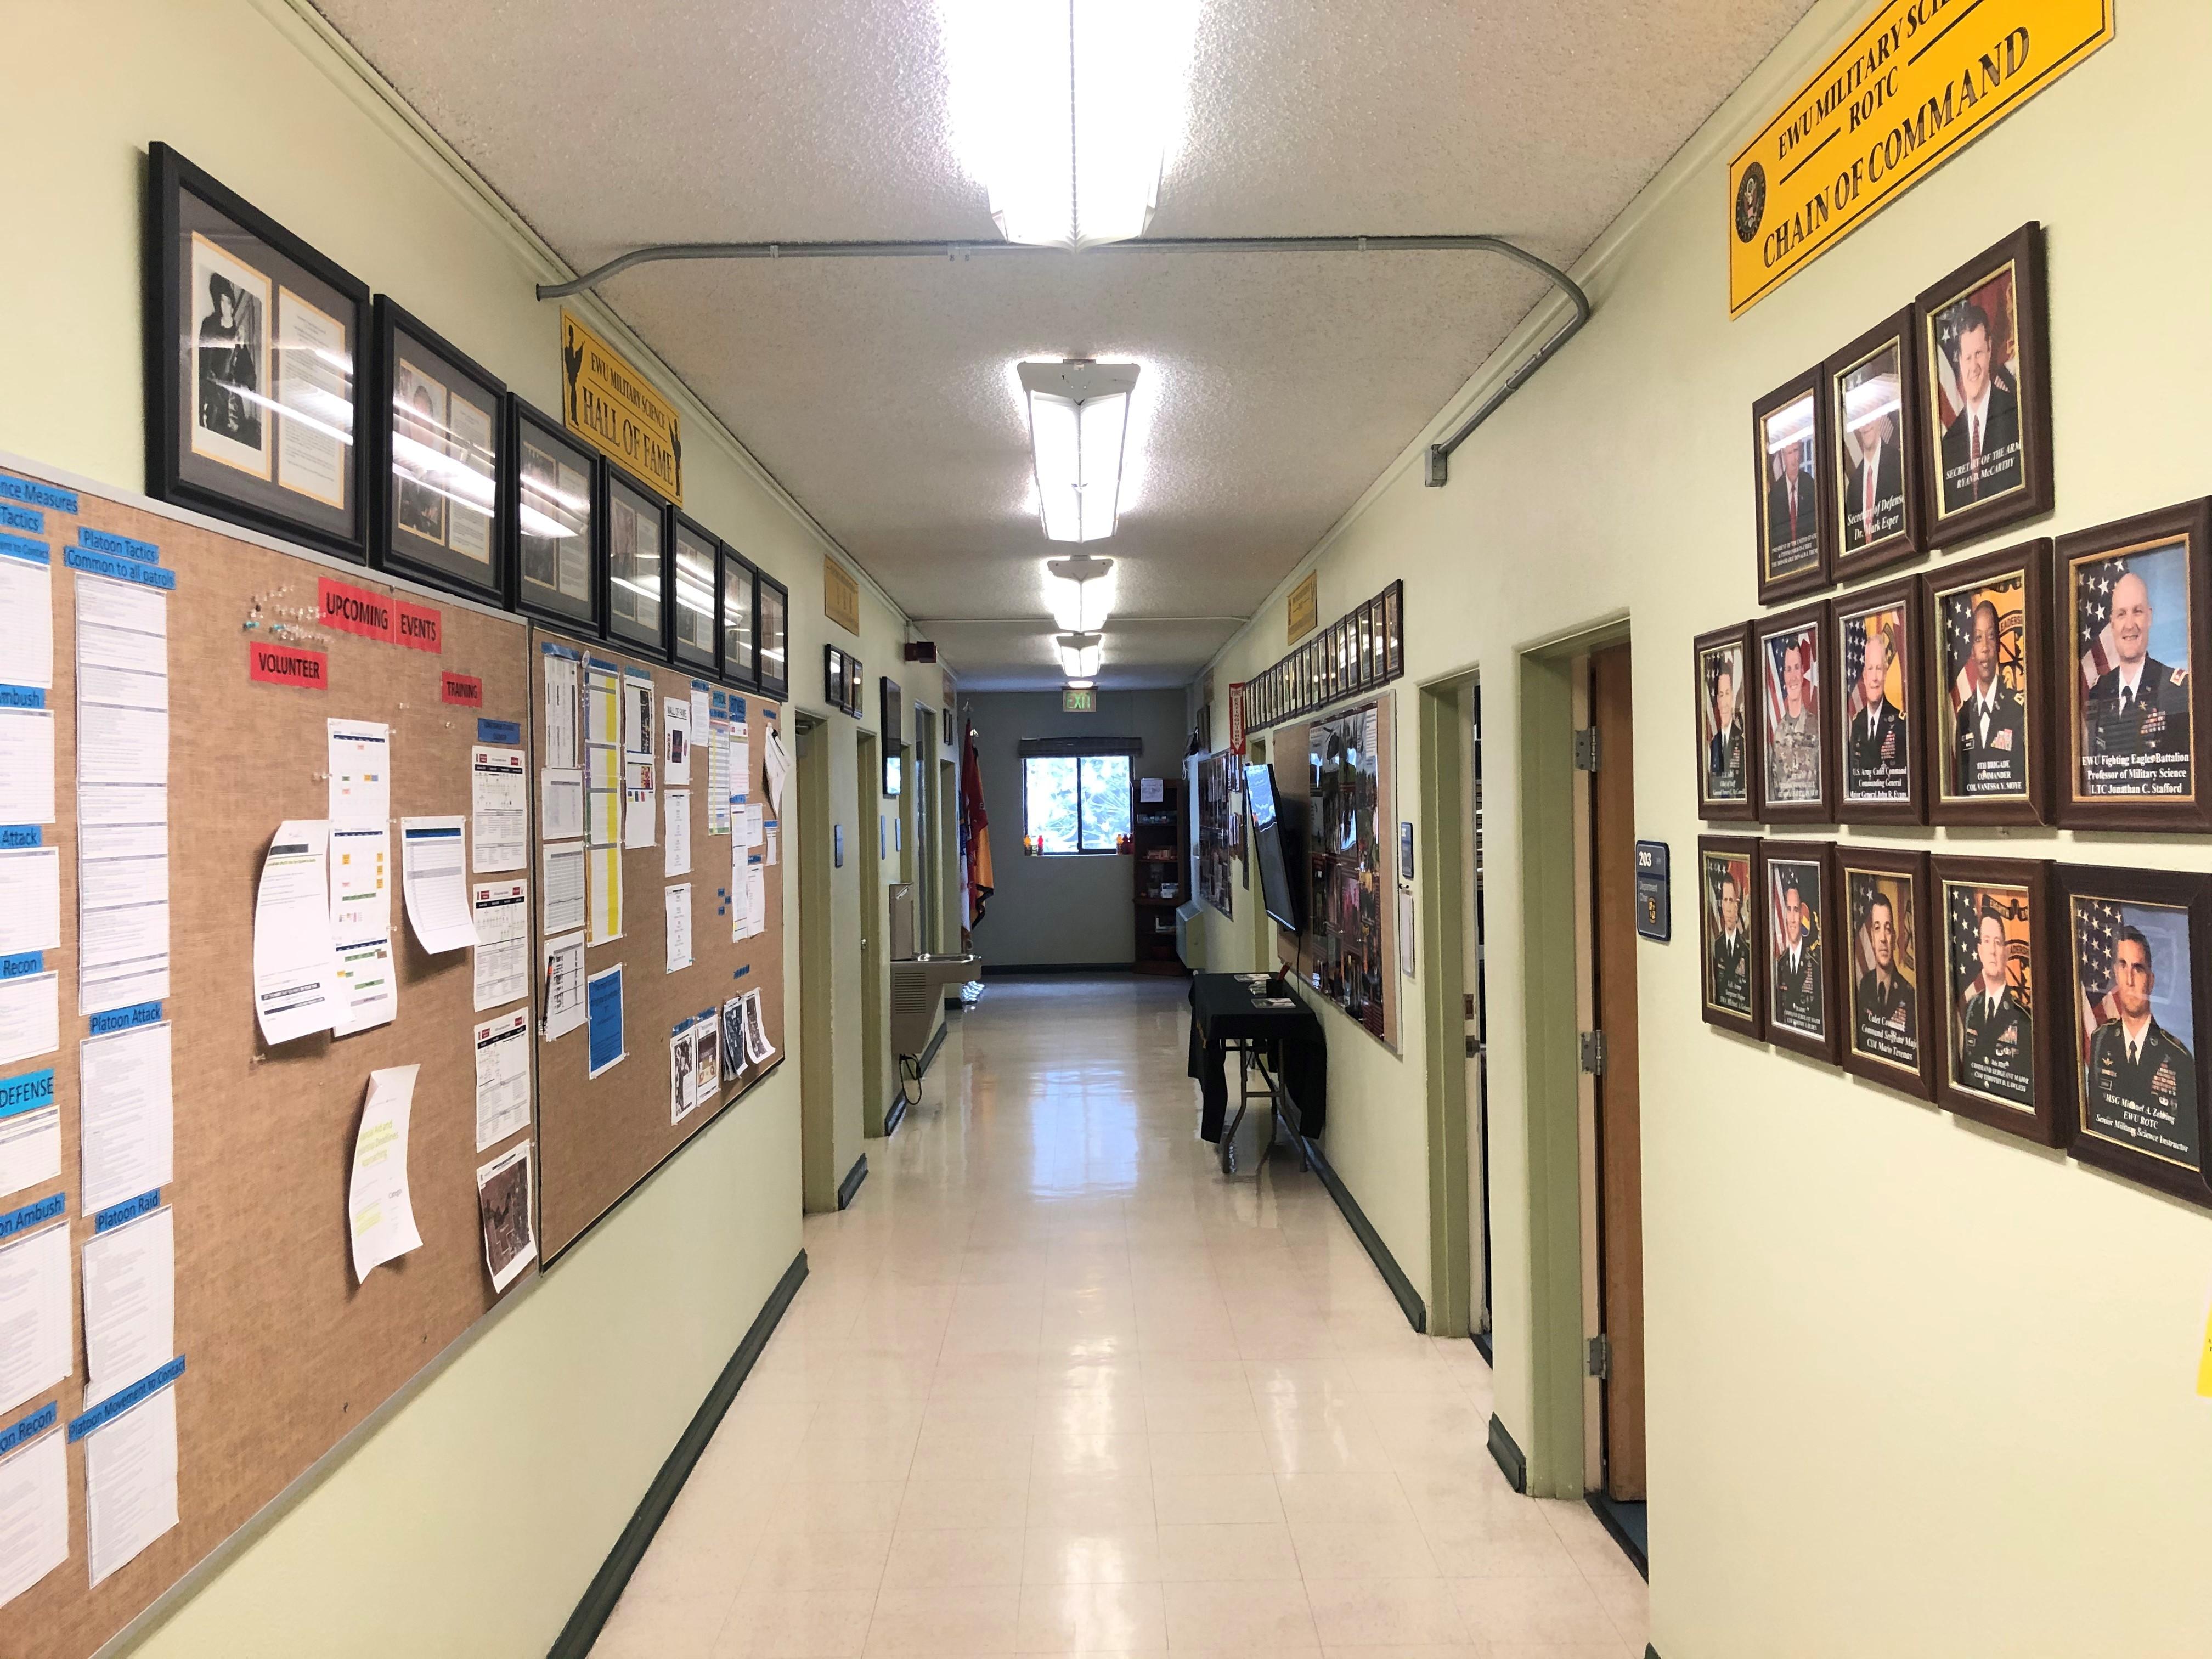 hallway in Cadet Hall